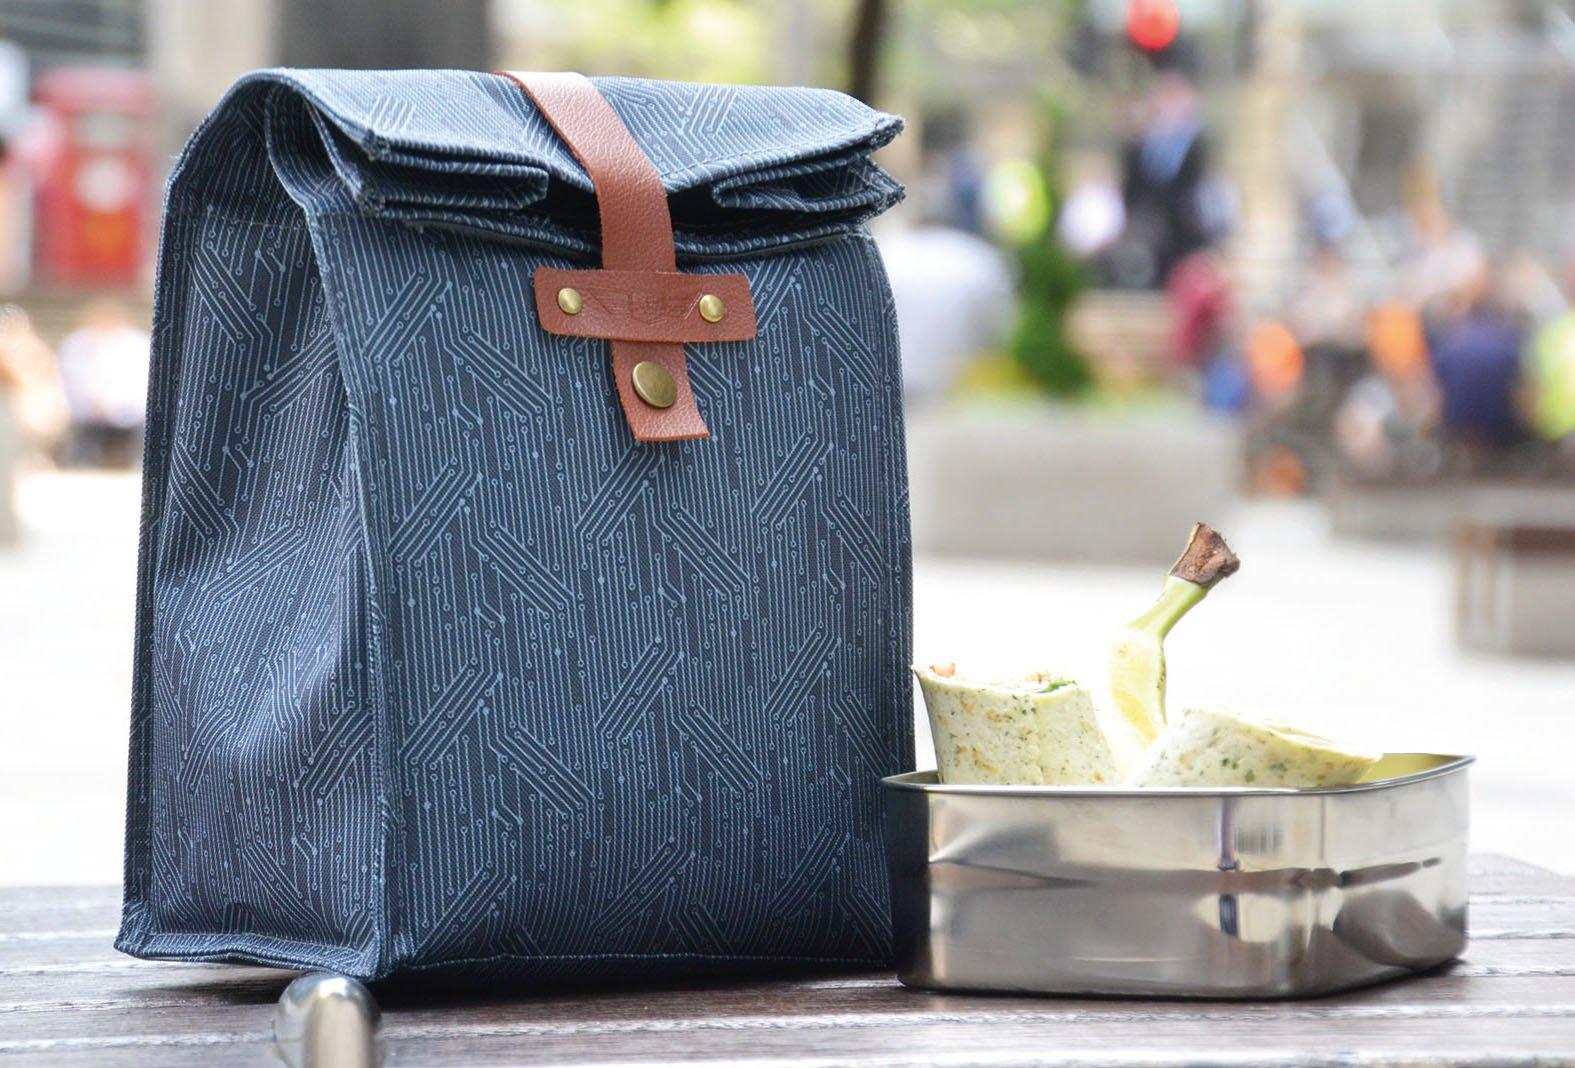 Beau Amp Elliot Circuit Mens Lunch Bag At Barnitts Online